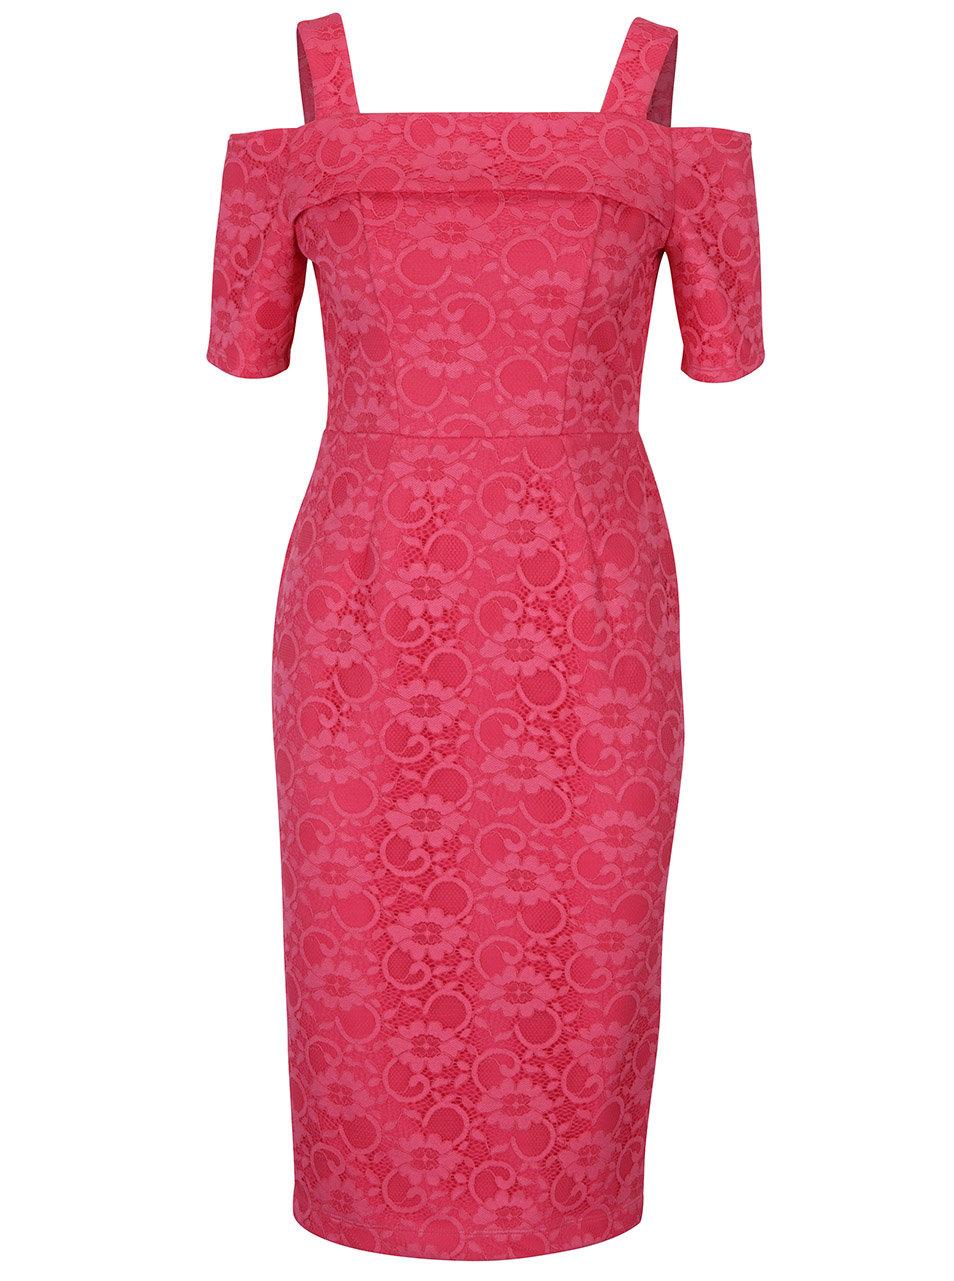 d4118fa3d Růžové krajkové pouzdrové šaty Dorothy Perkins | ZOOT.cz